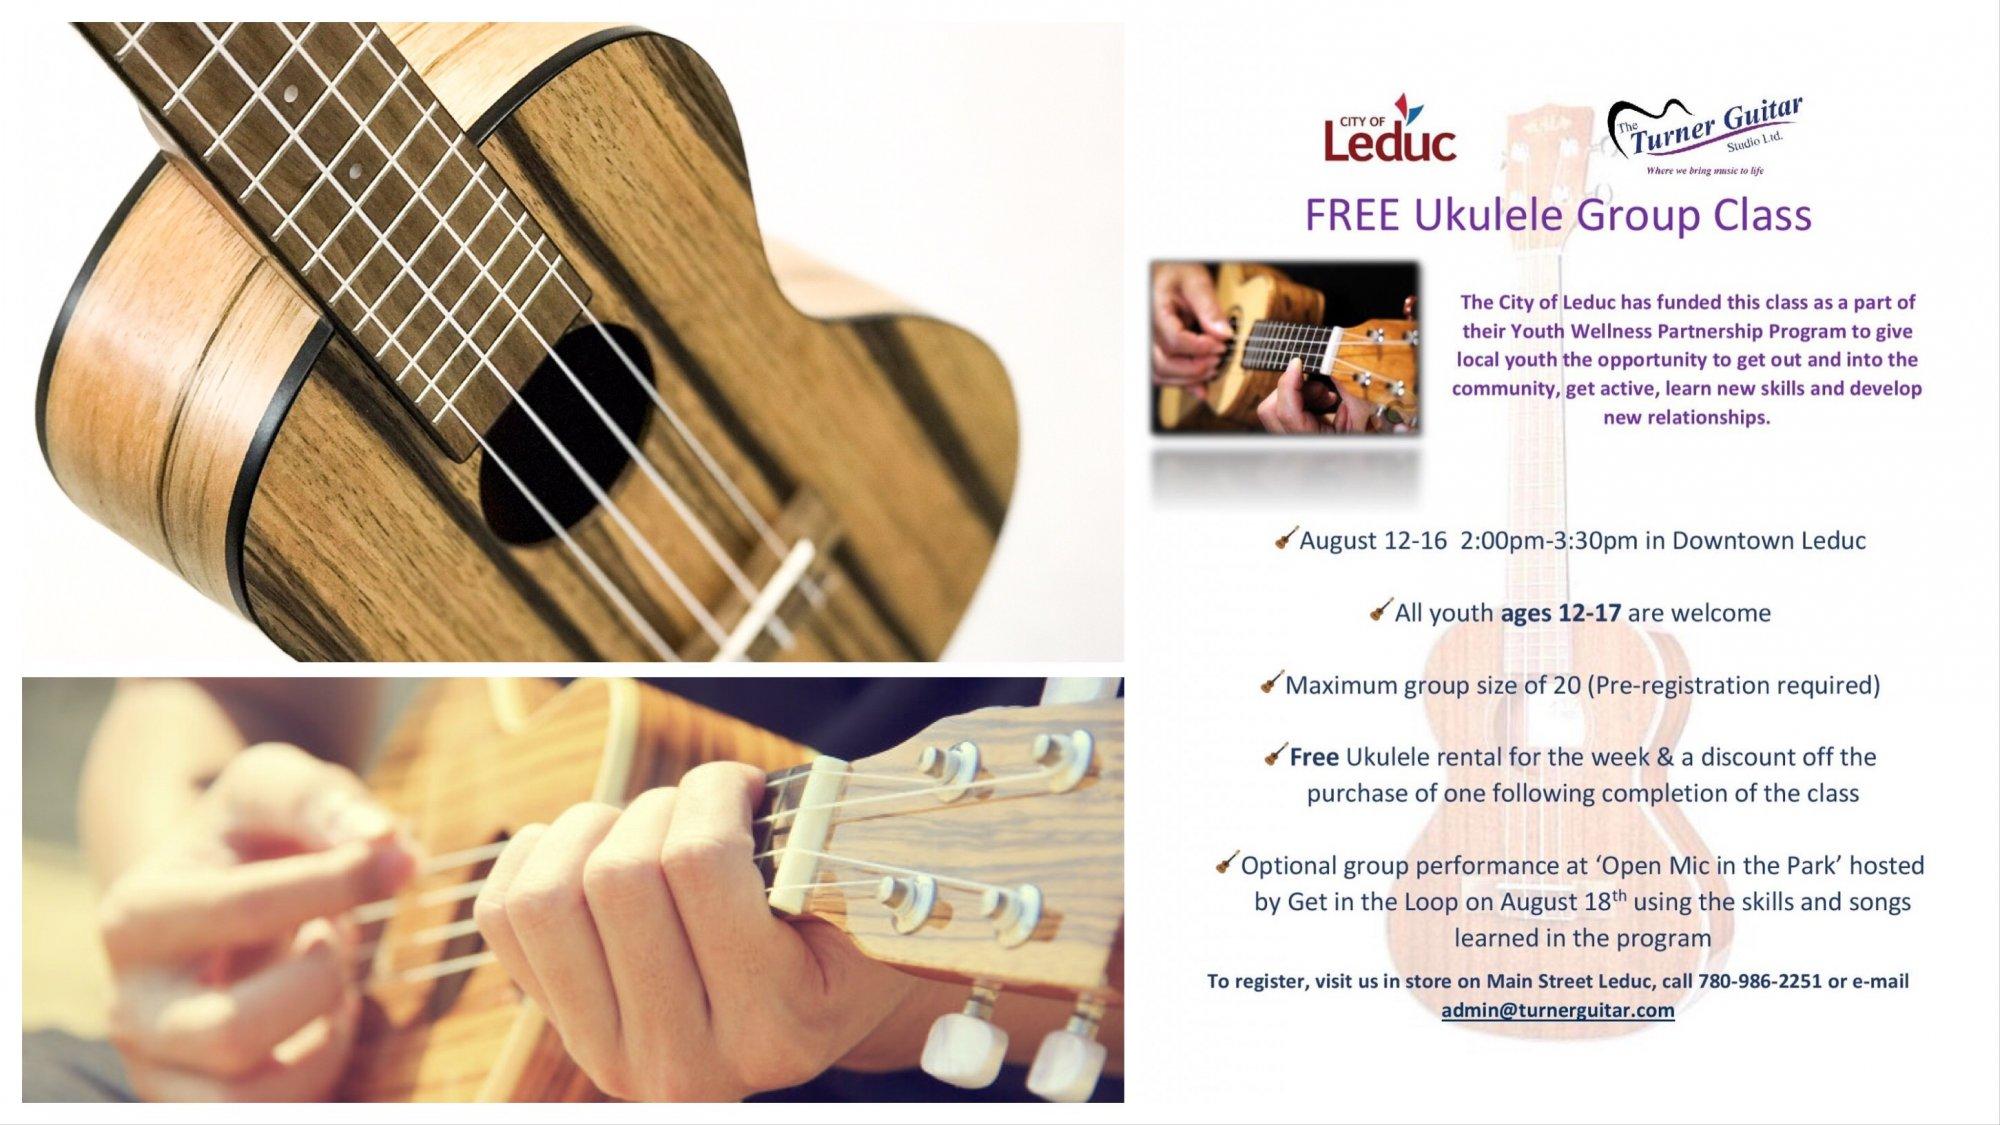 Home | The Turner Guitar Studio LTD | Leduc, Alberta